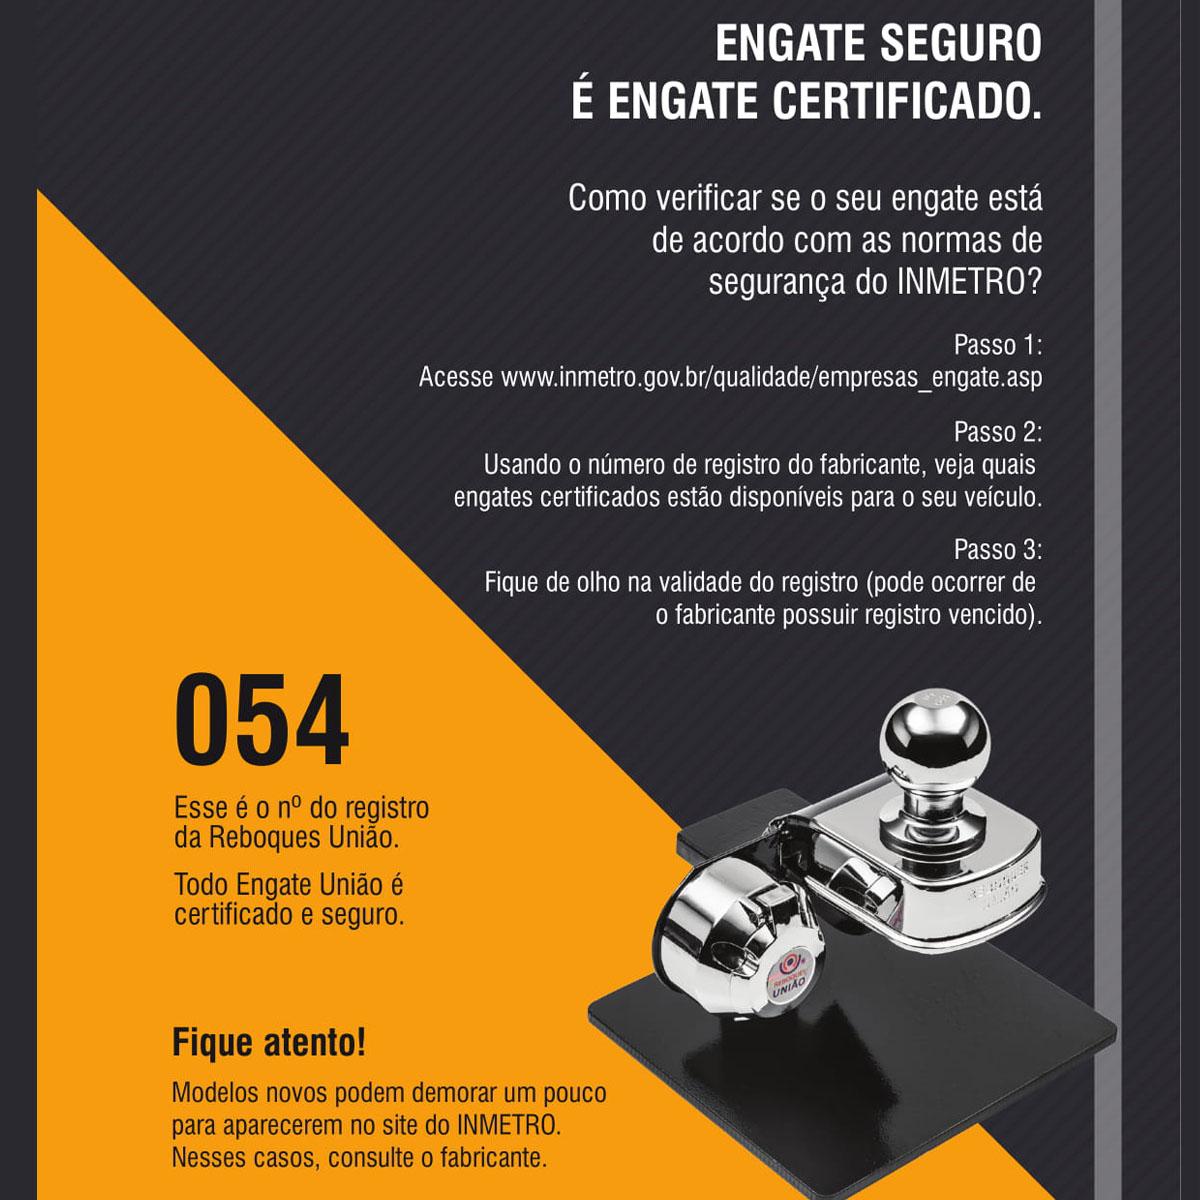 ENGATE DE REBOQUE RENEGADE SPORT/LONG.-4X4 REMOVÍVEL REBOQUES UNIÃO REMOVÍVEL